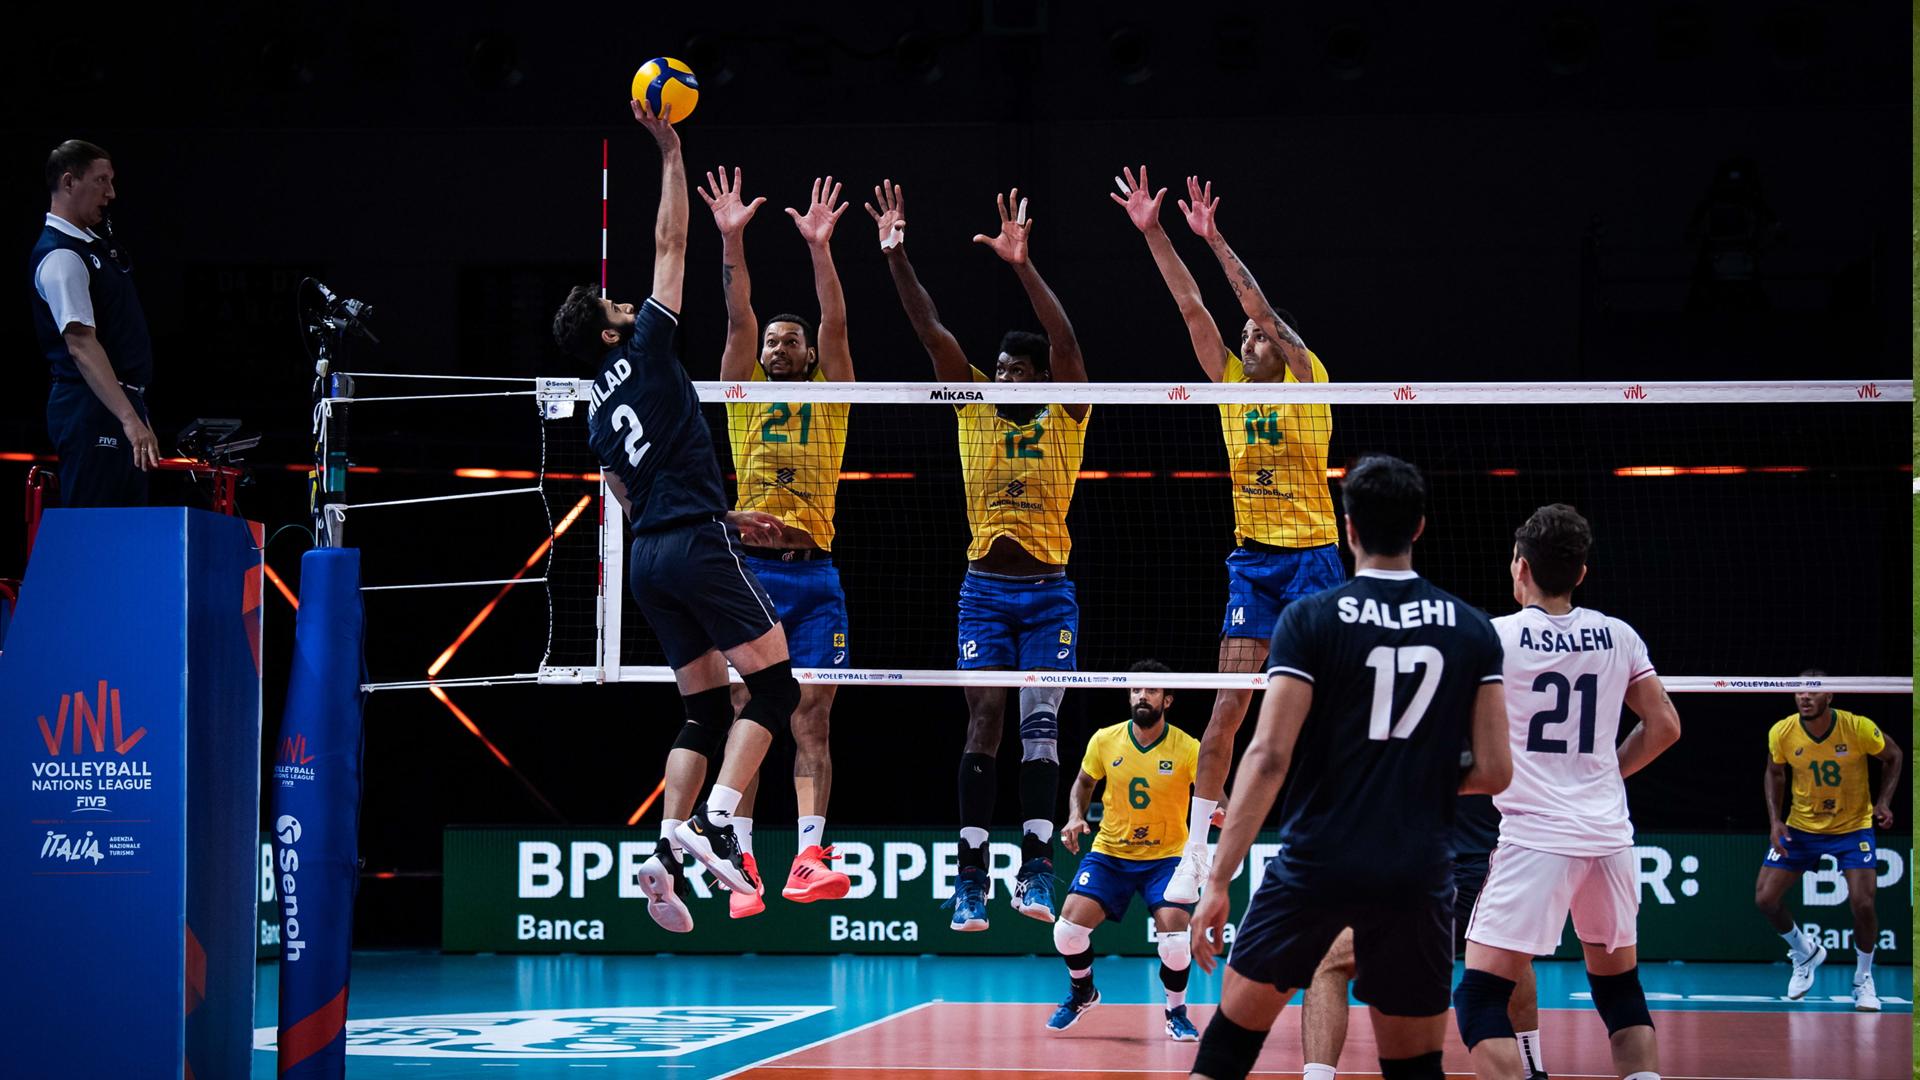 Volleyball Nations League: Iran 1-3 Brazil